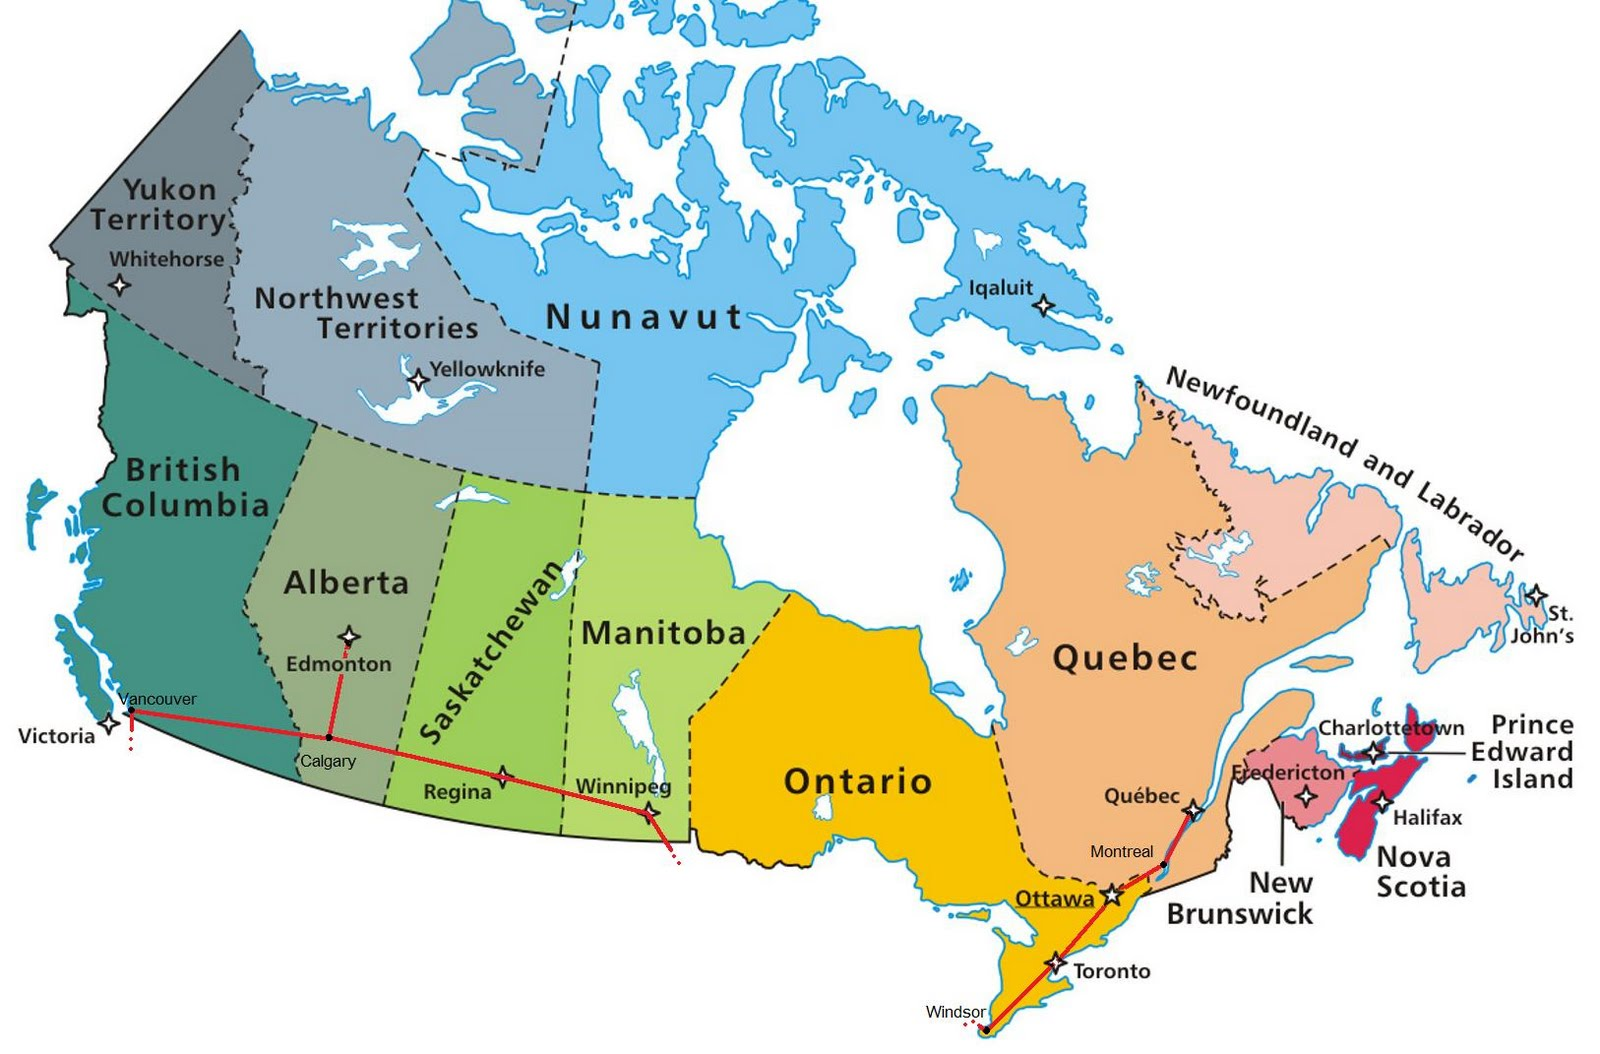 high speed rail, high speed trains, high speed rail Canada, high speed trains Canada 1